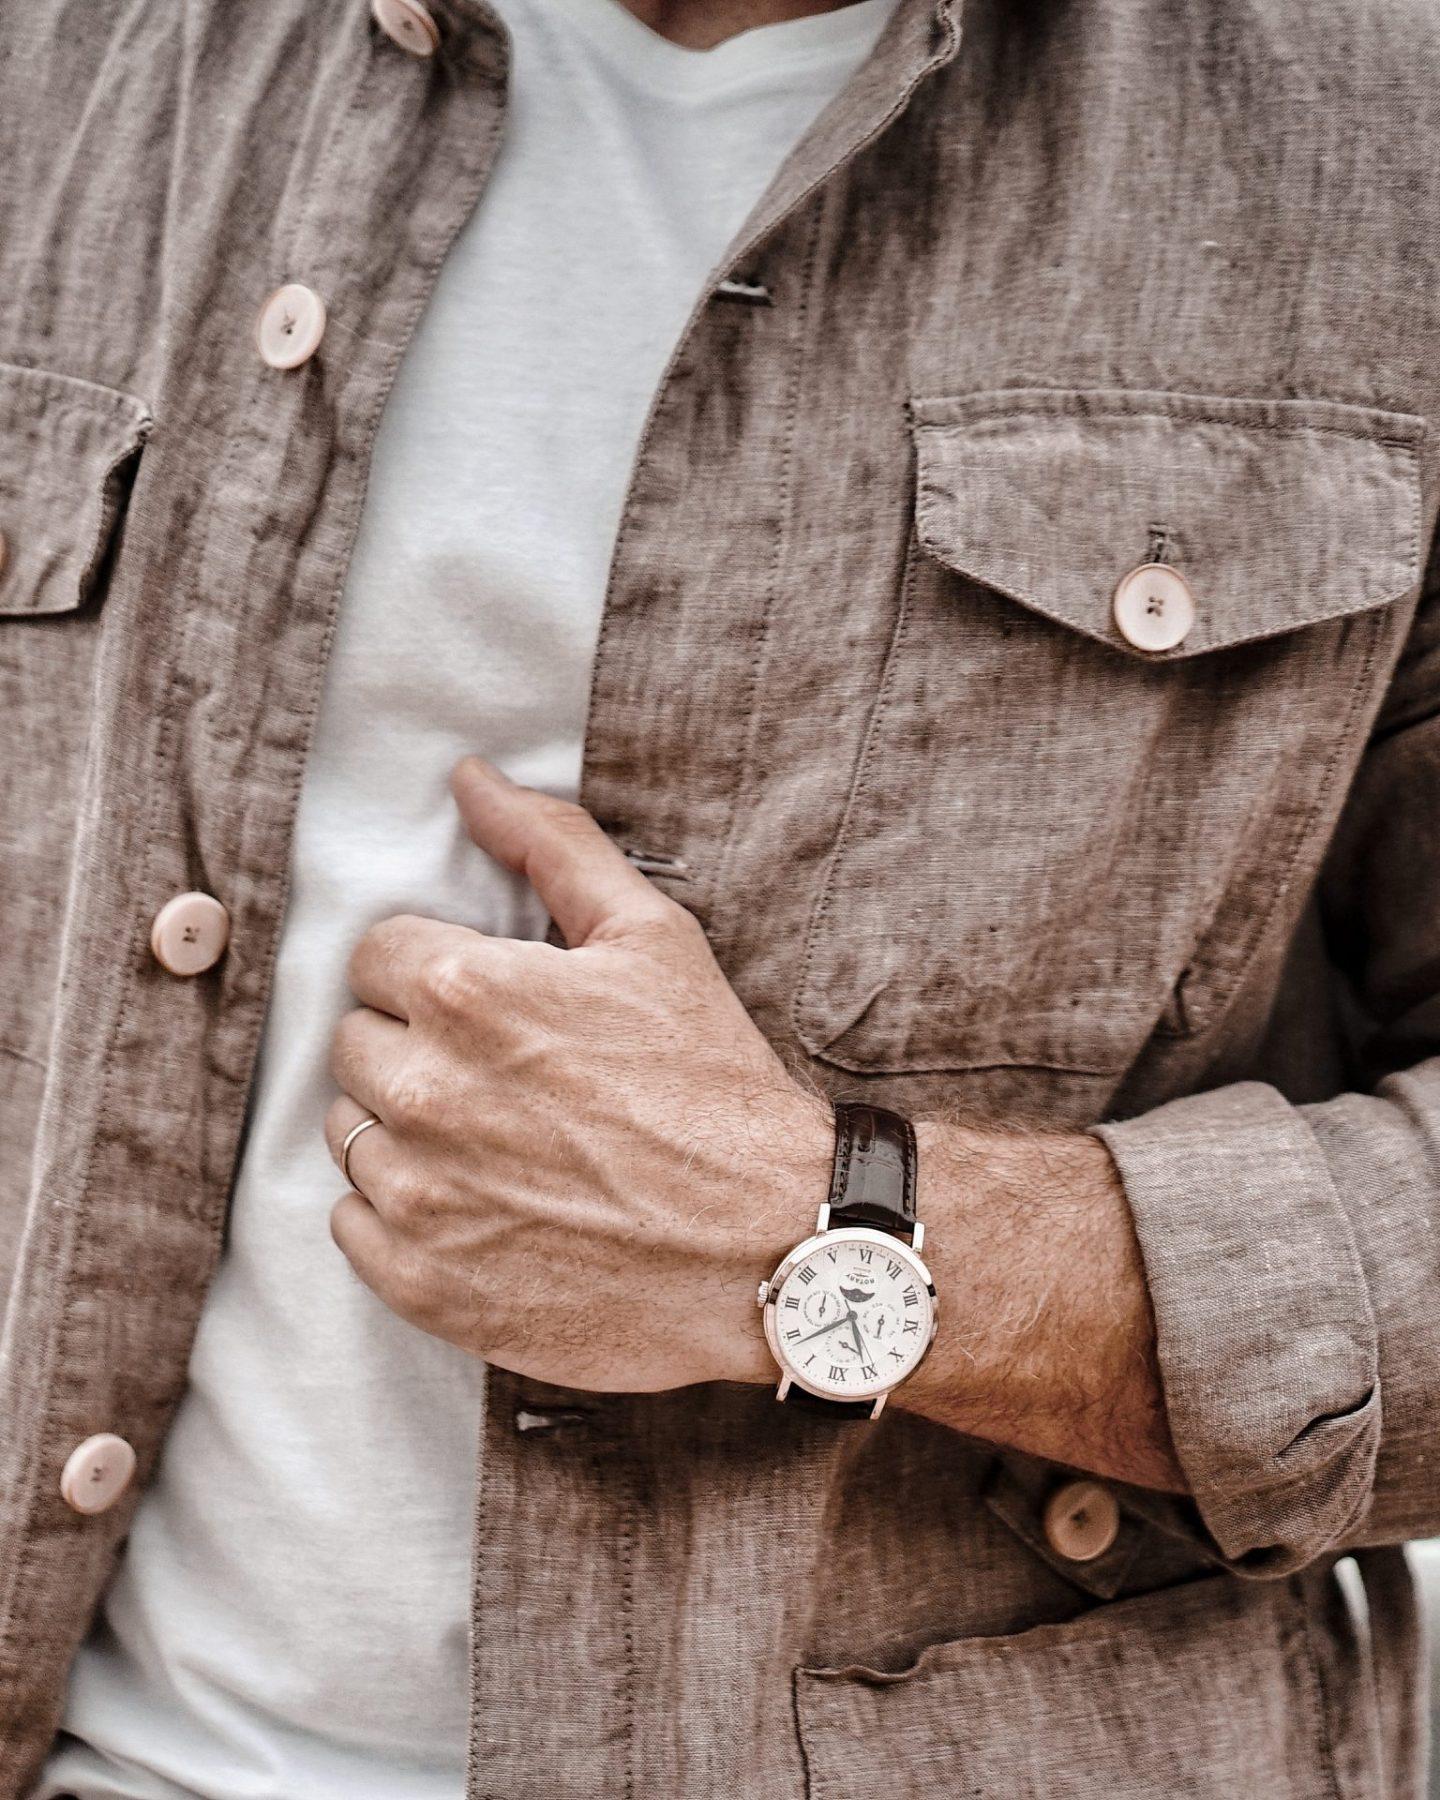 Mango Man Safari Jacket, Diesel Trousers, Menswear Style Fashion AW19 Lookbook Rotary Watch